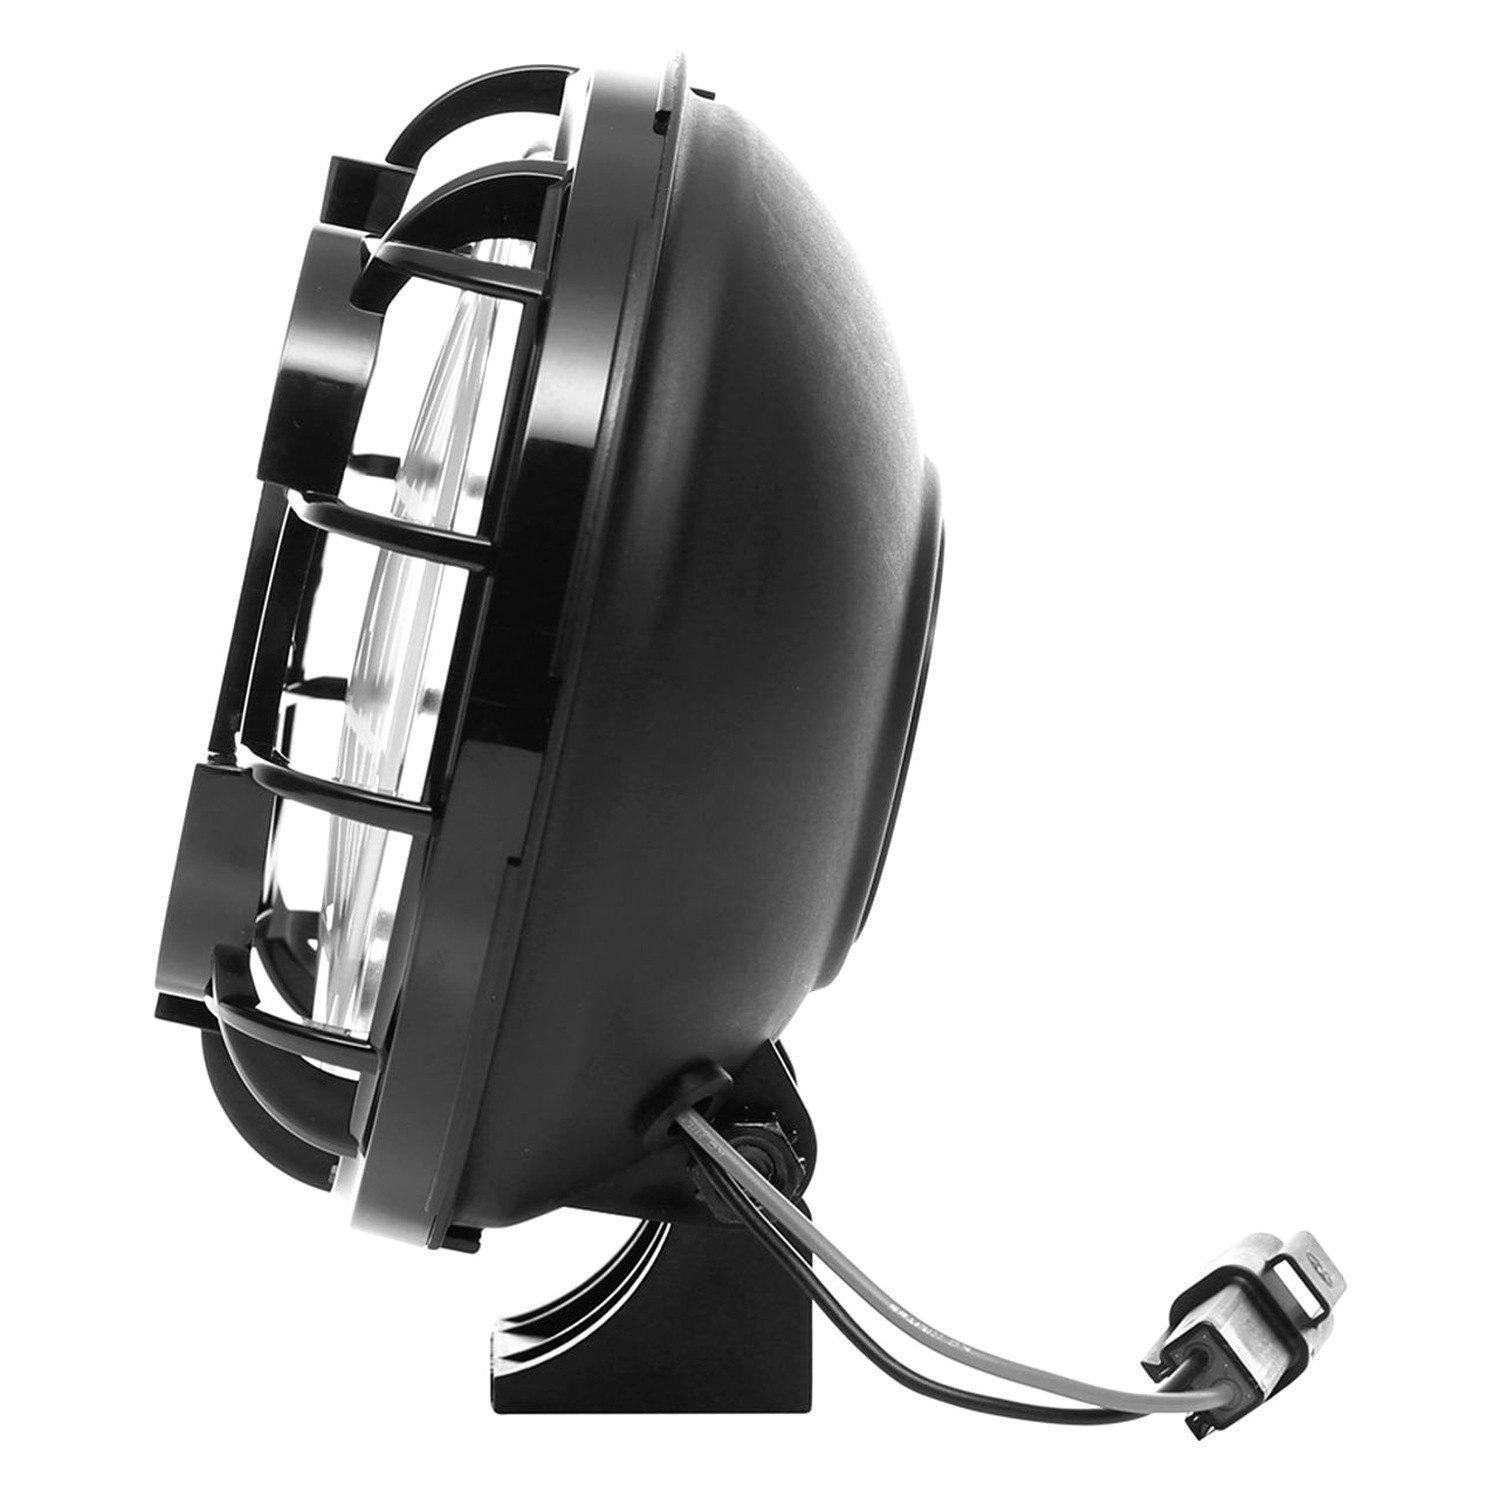 Kc Hilites 9150 Apollo Pro 6 2x100w Round Spot Beam Lights Wiring Harness Diagram Rear Viewkc